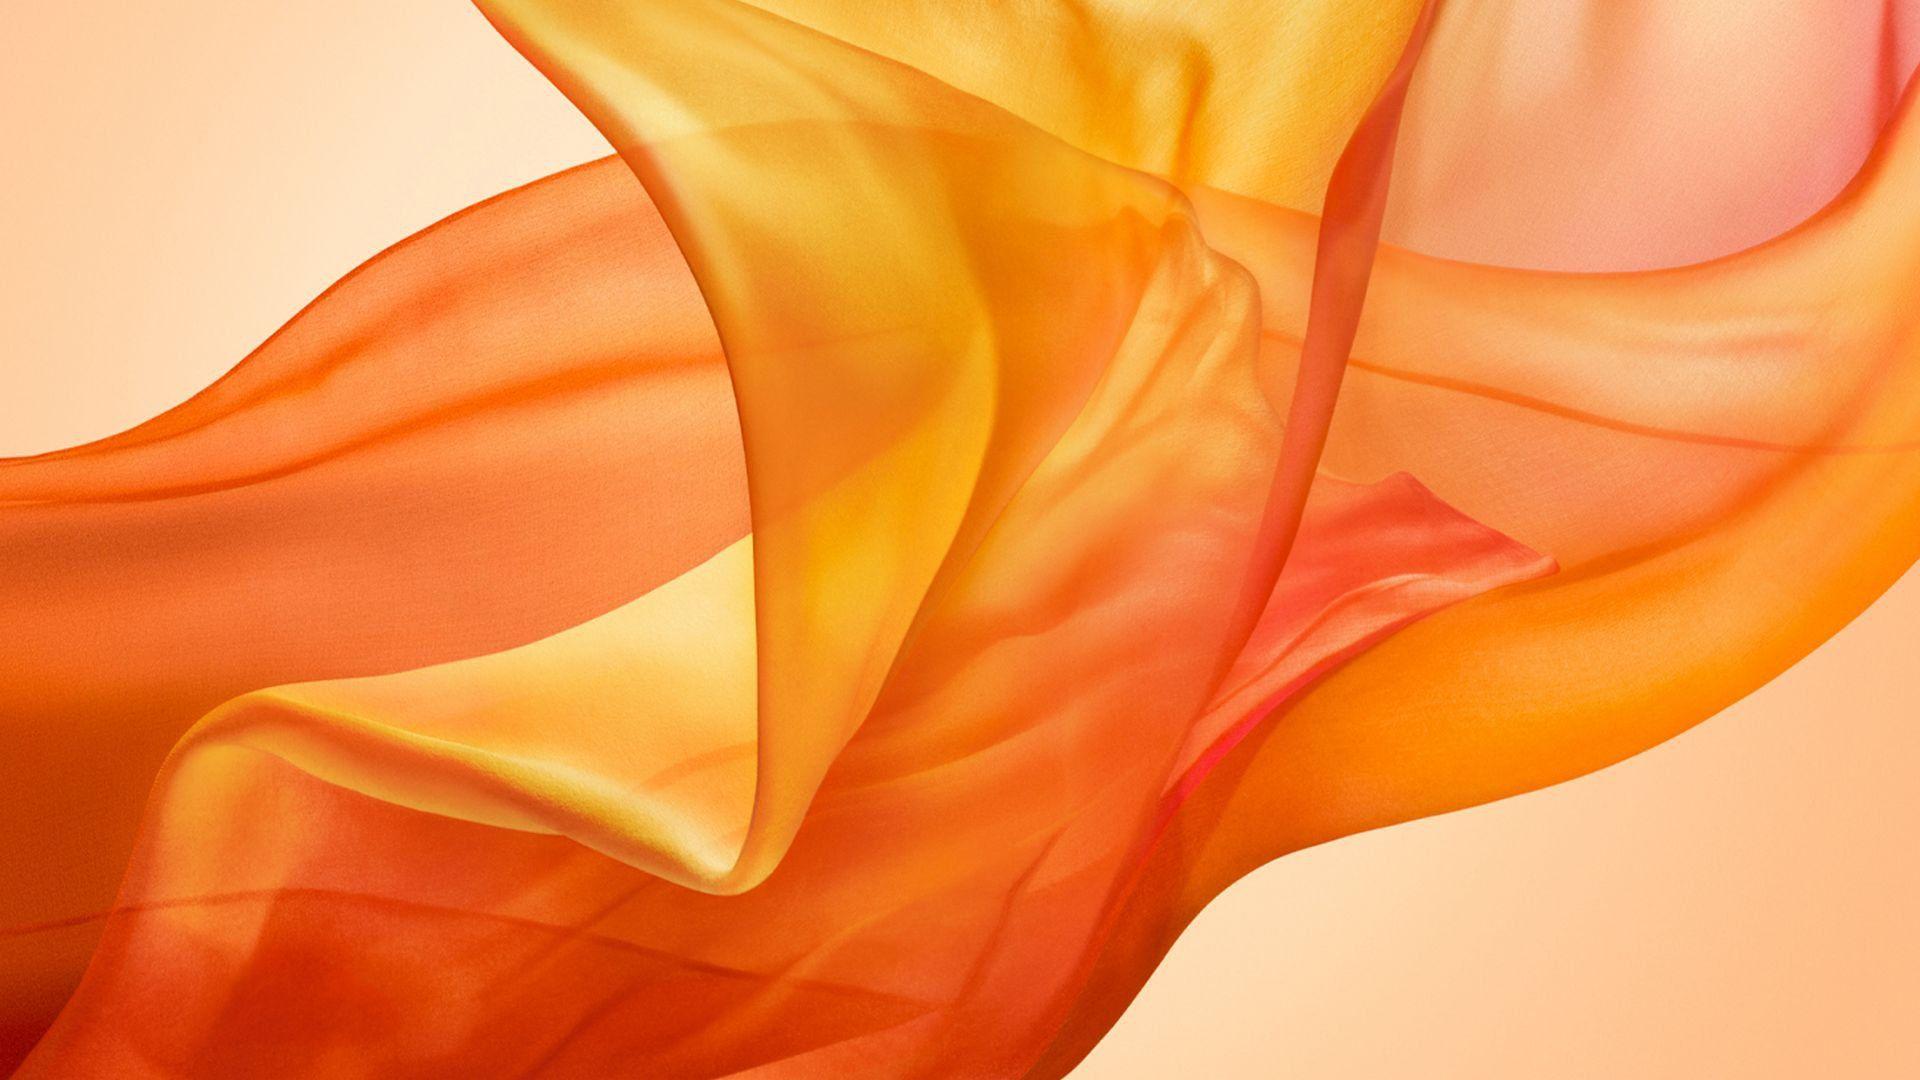 Macbook Air background image